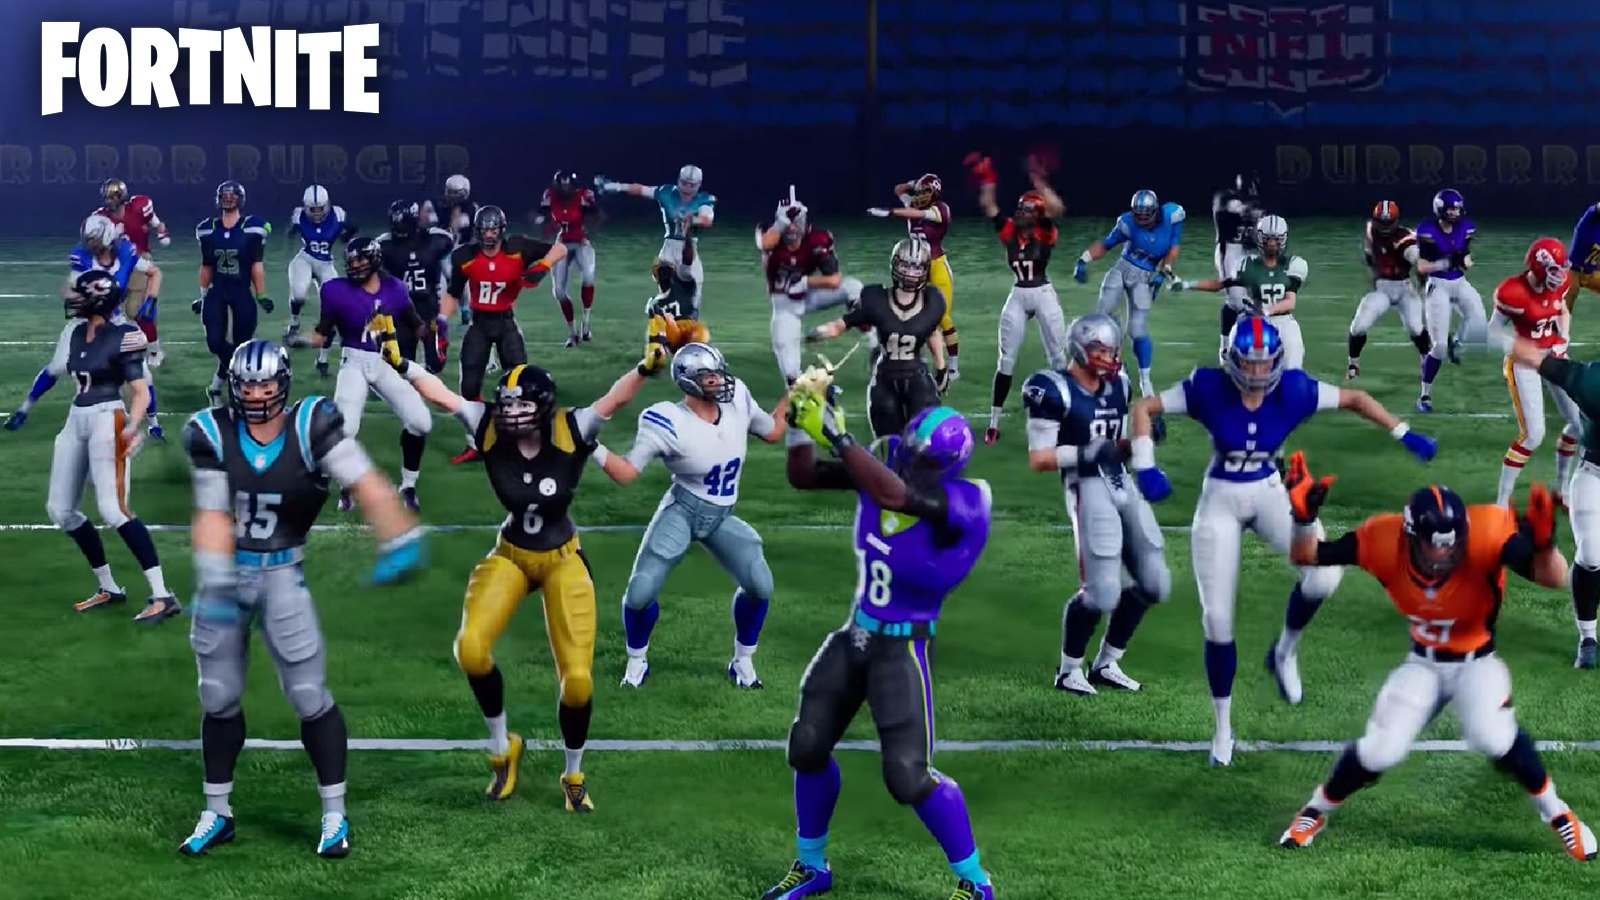 Skins Fortnite NFL